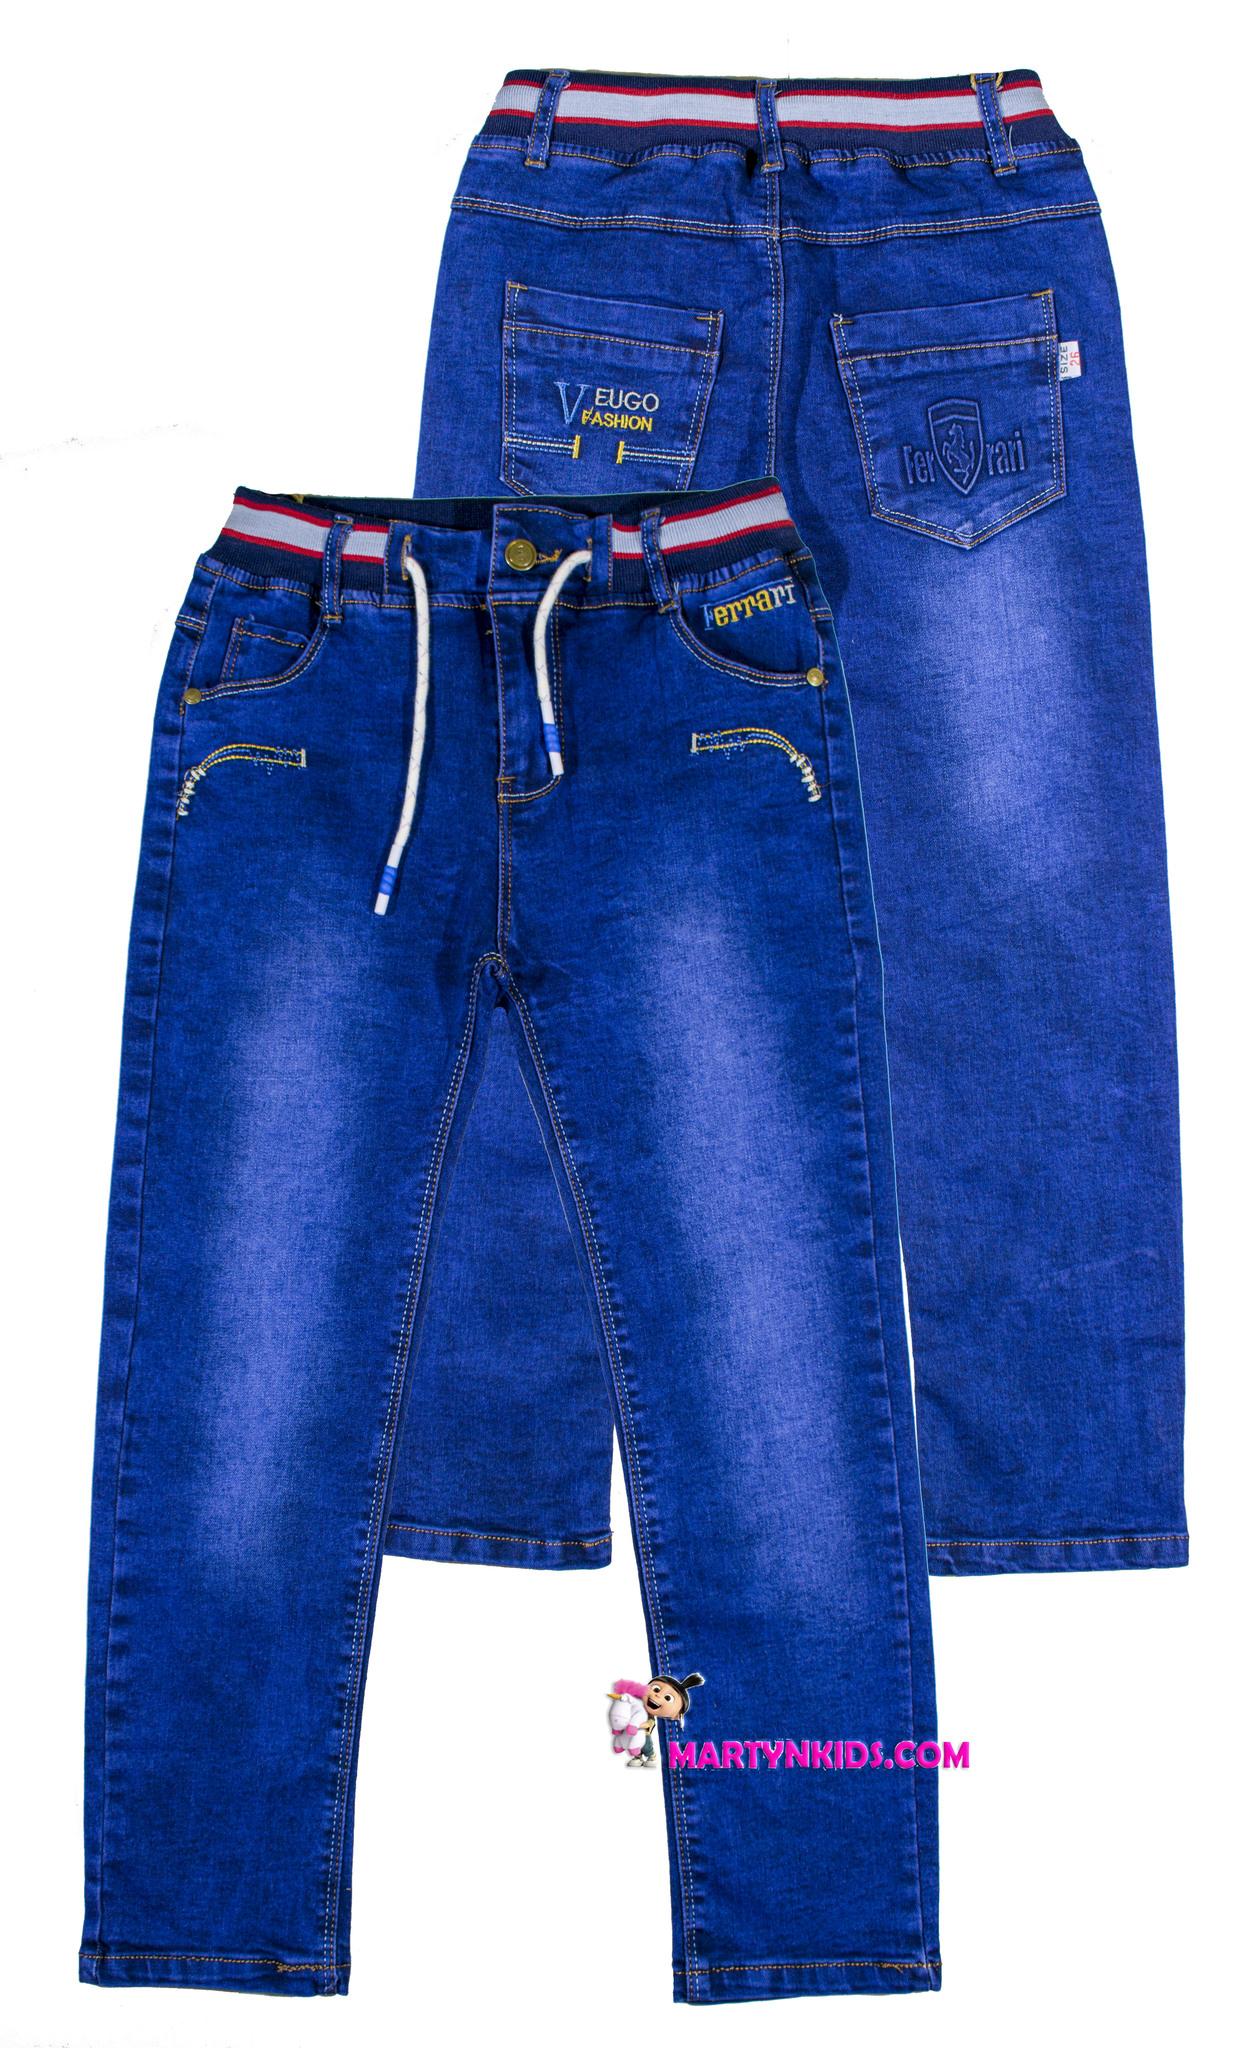 507 джинсы феррари 2